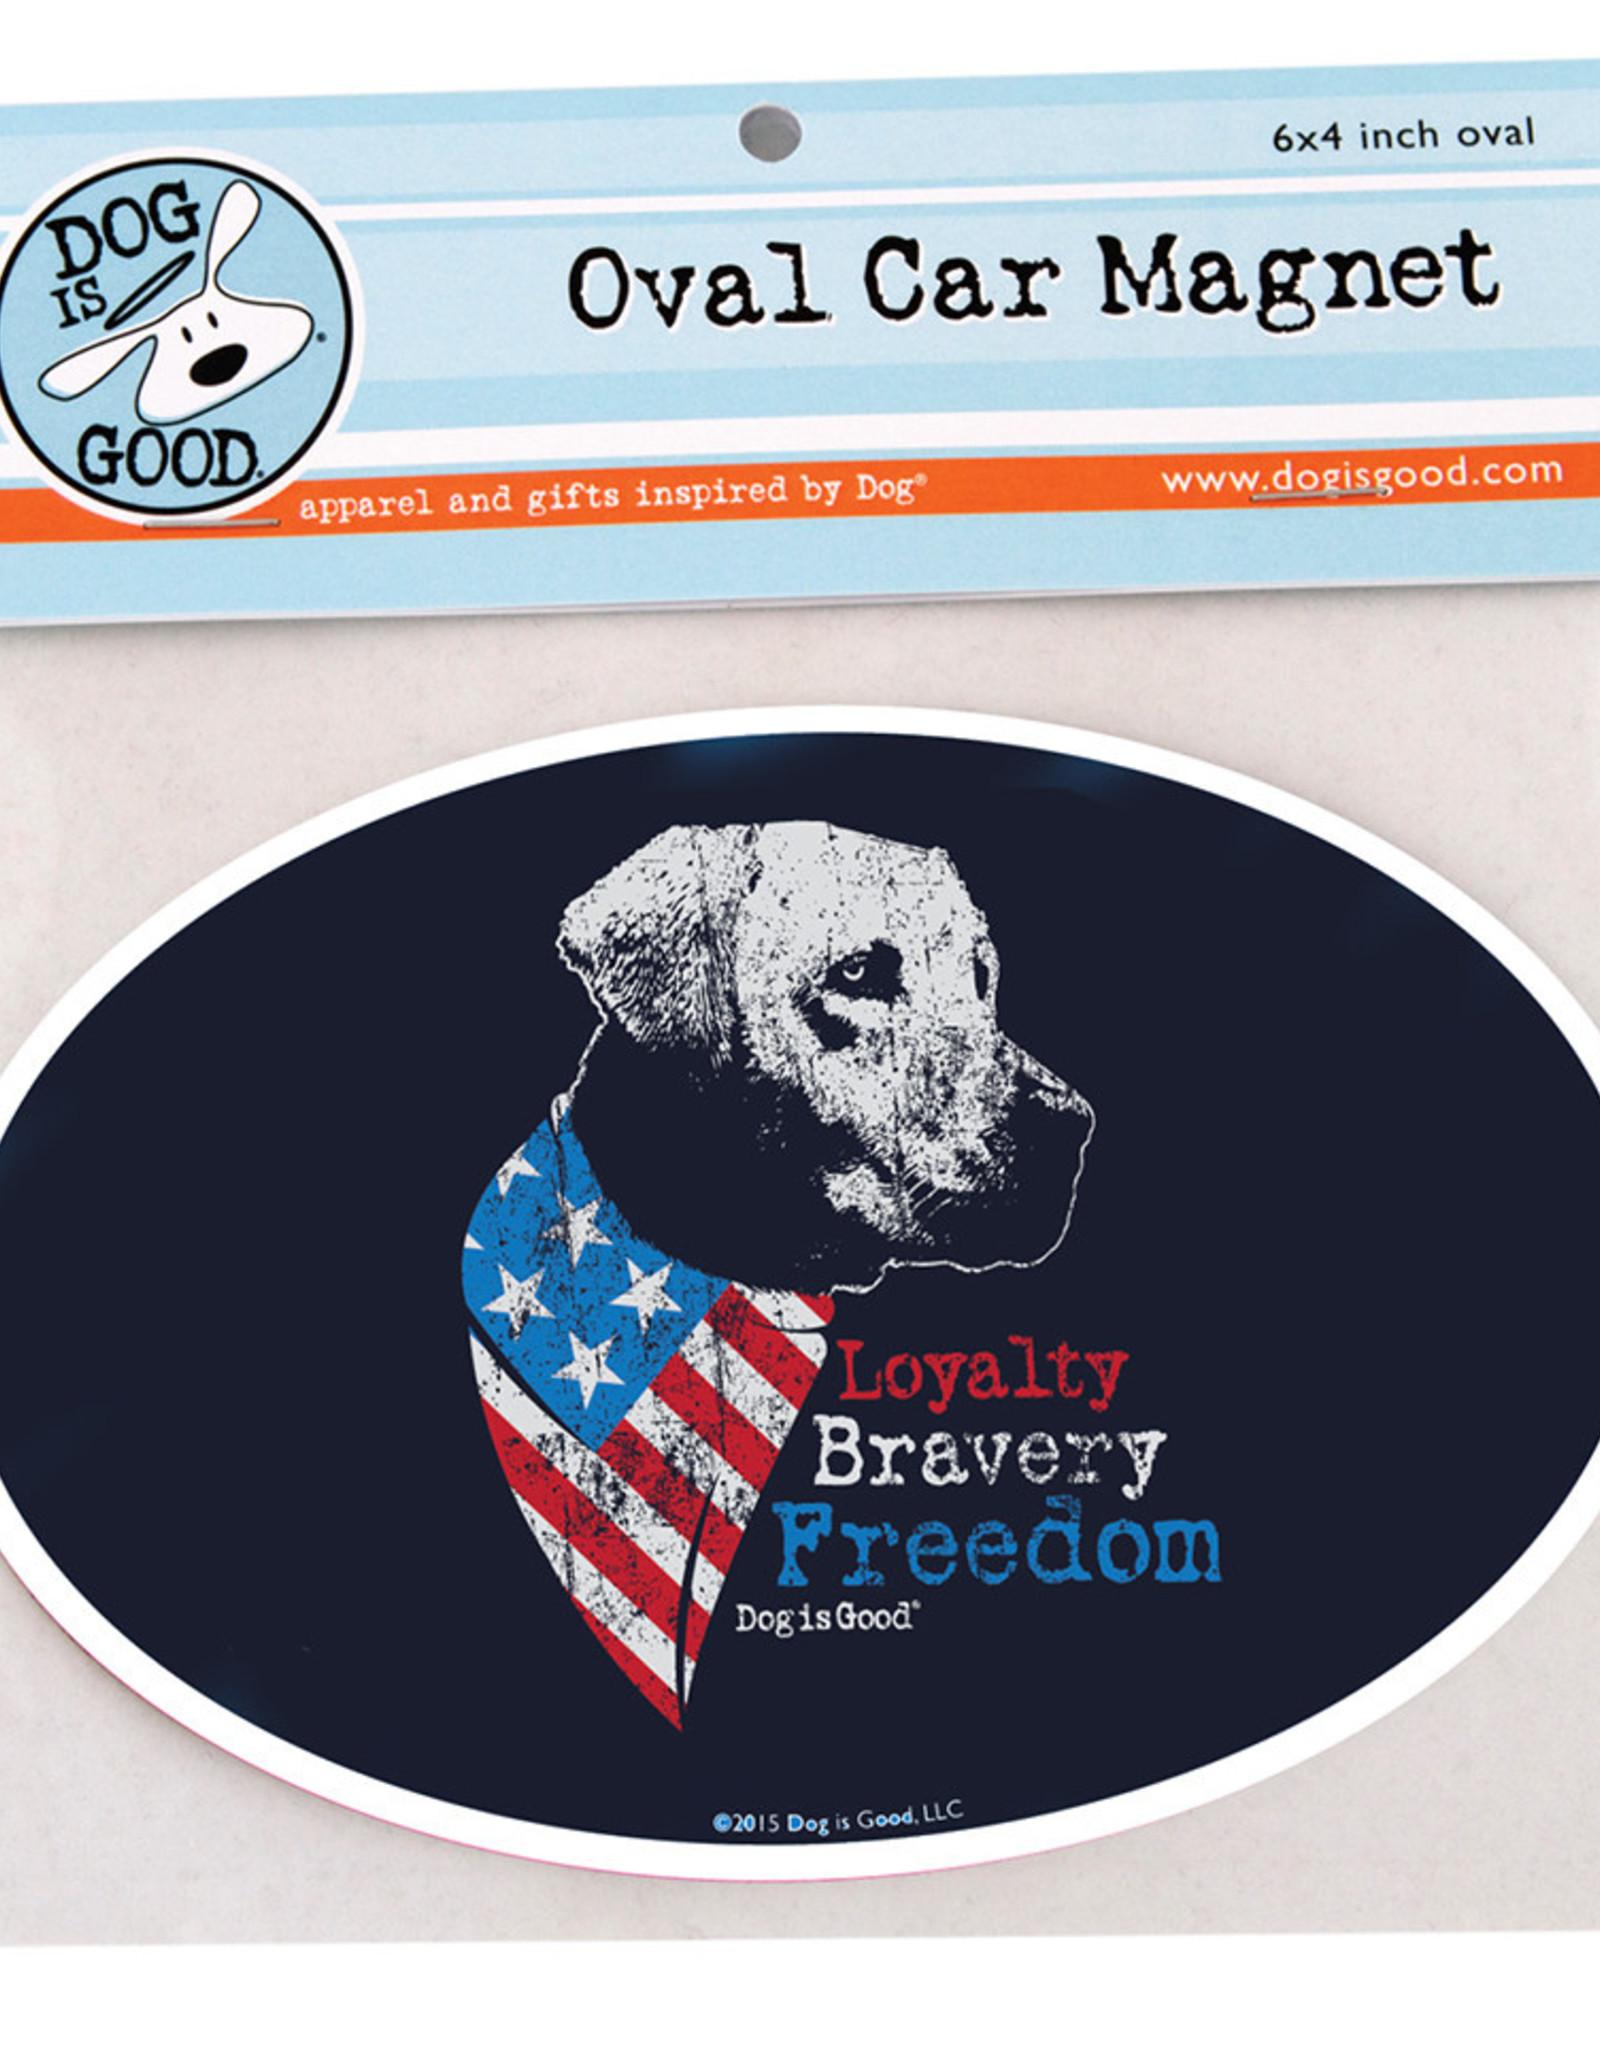 Dog Is Good Car Magnet: Freedom Dog